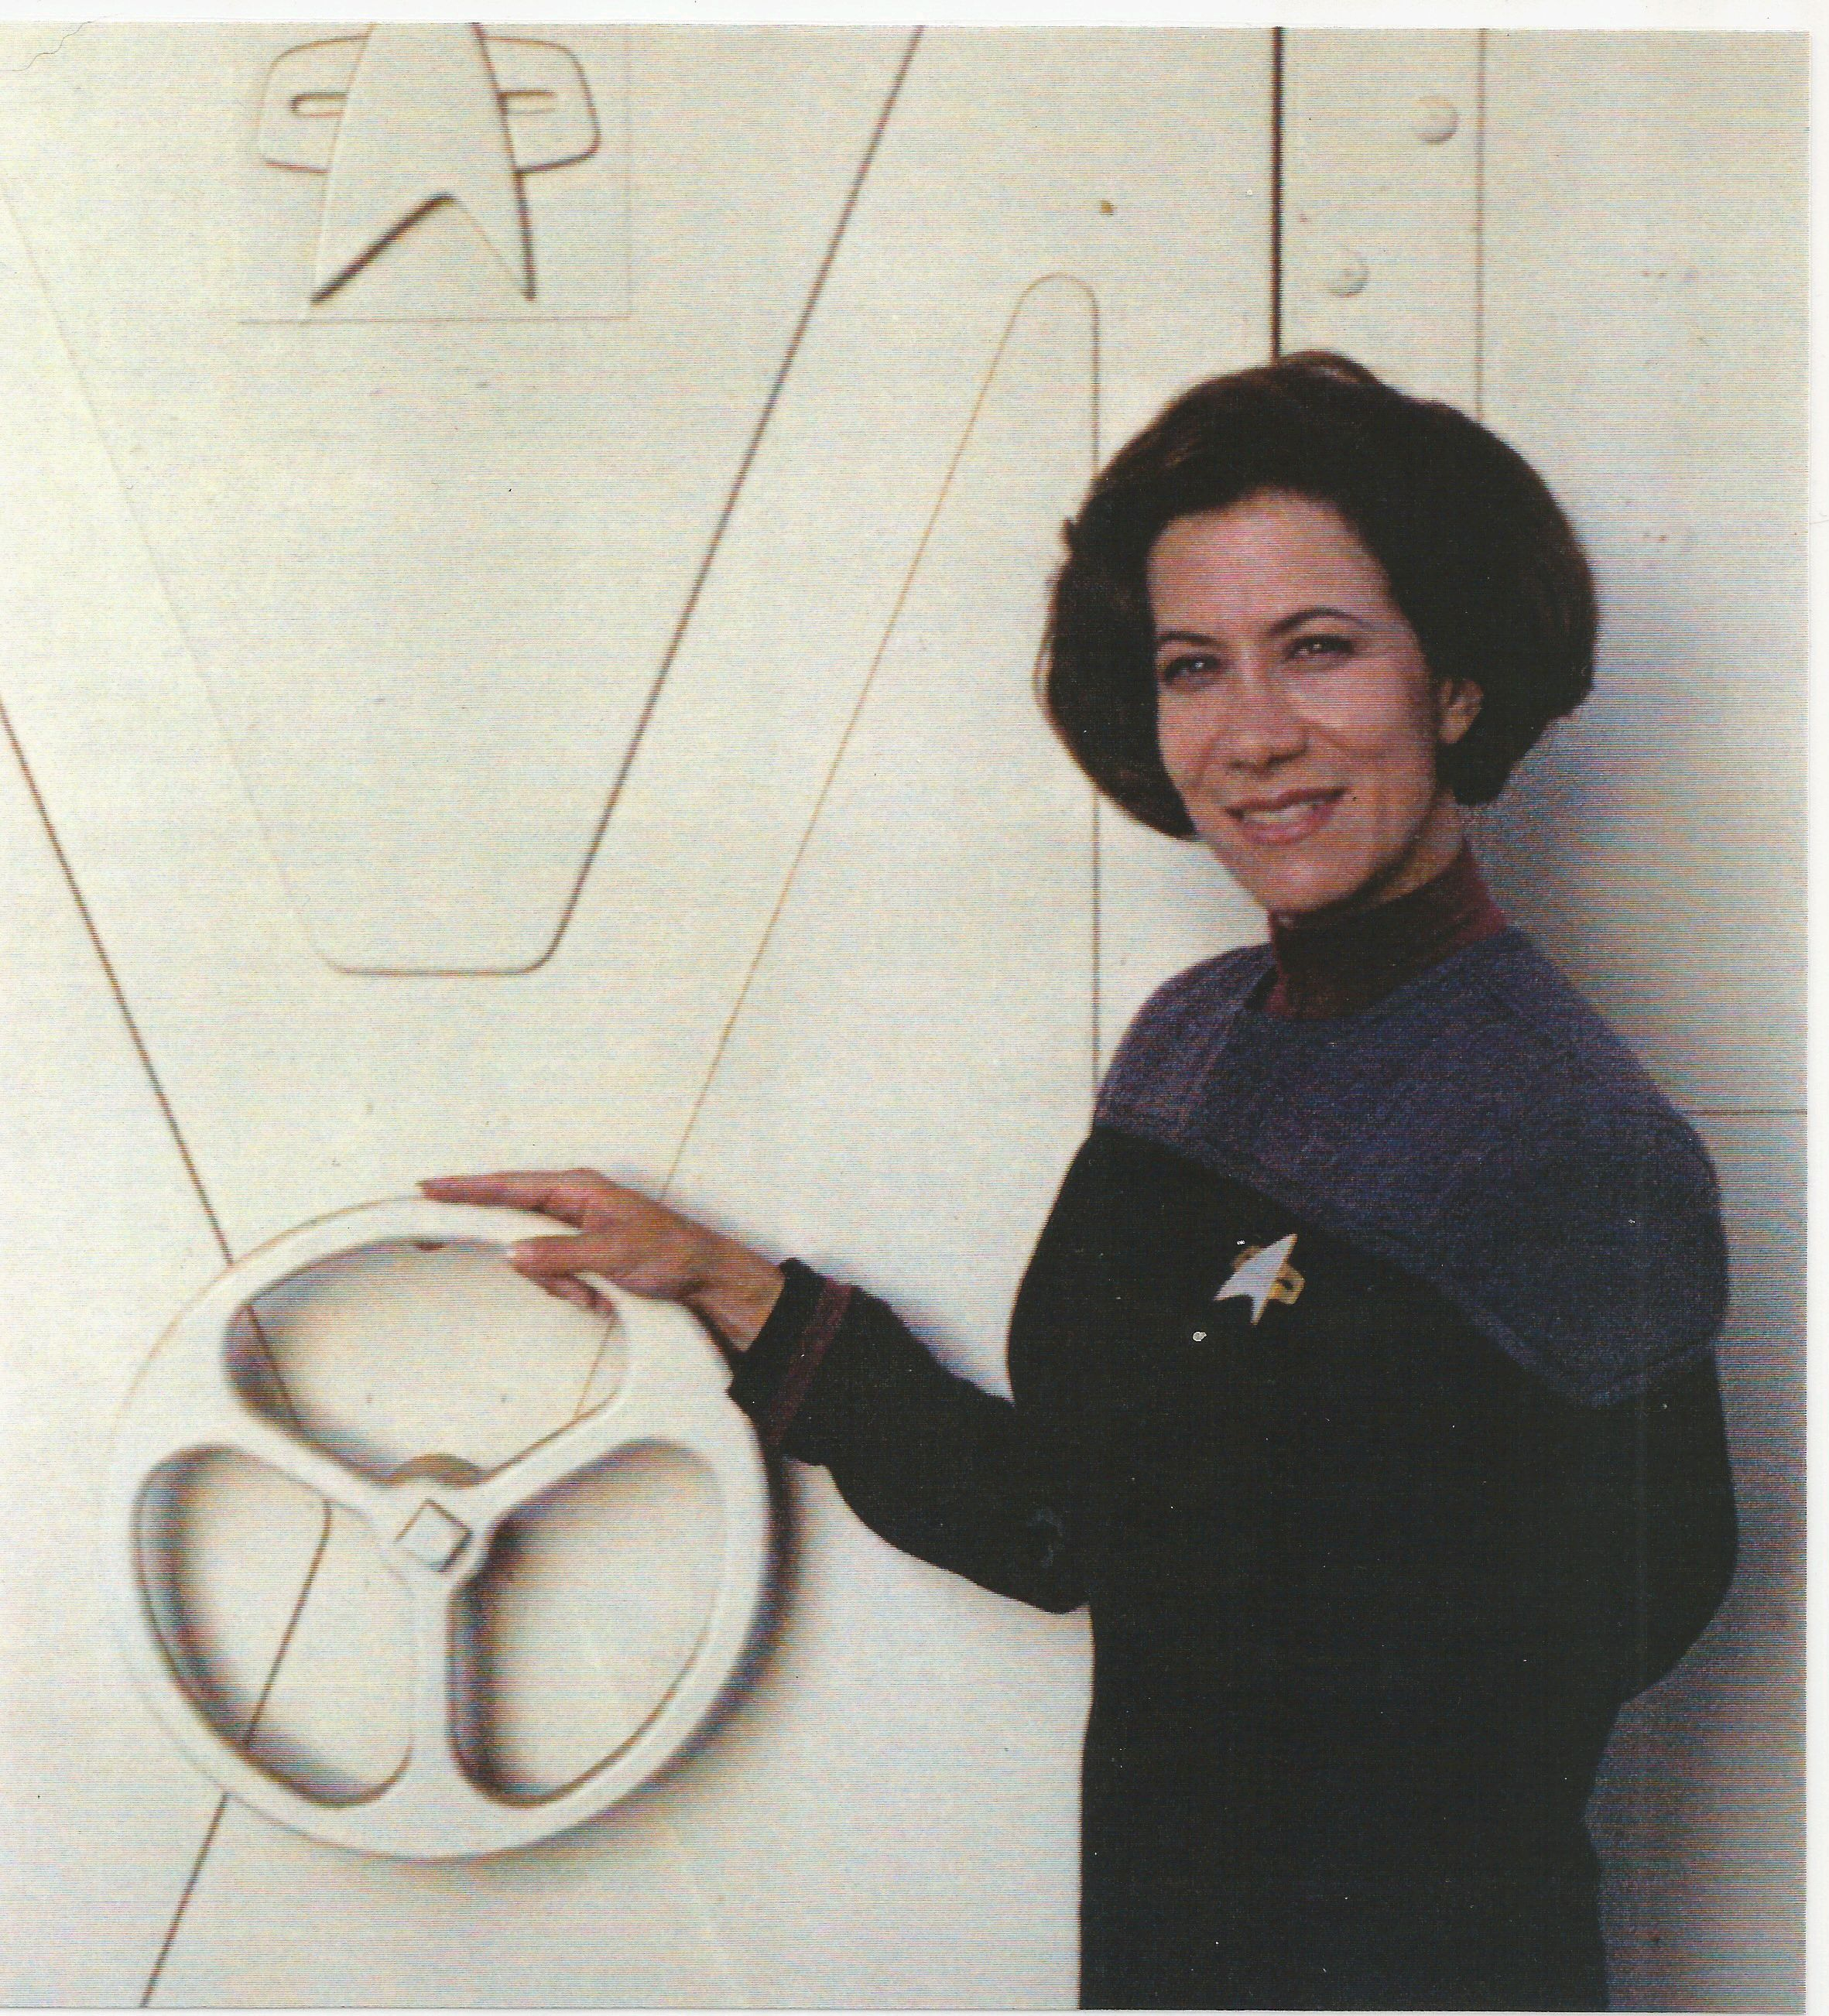 Maria Keogh (born 1982) recommendations